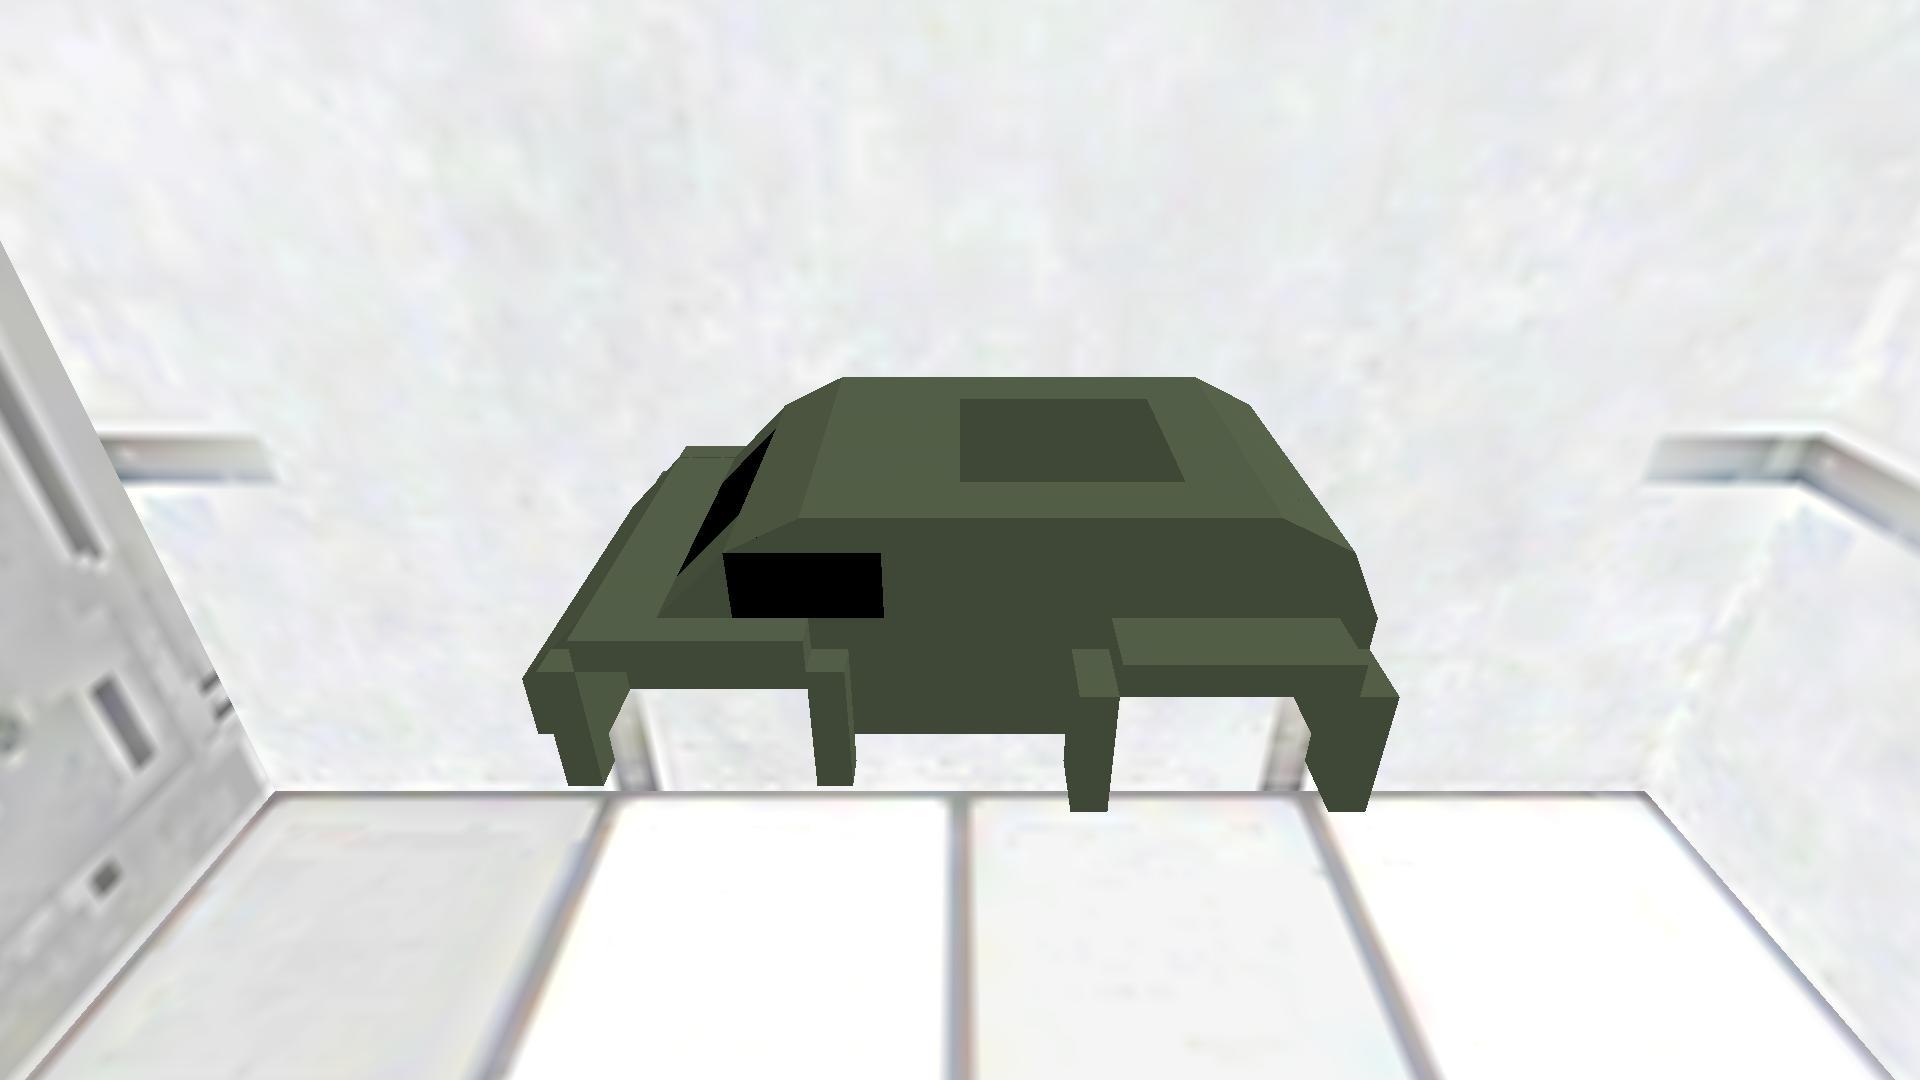 Humvee frame